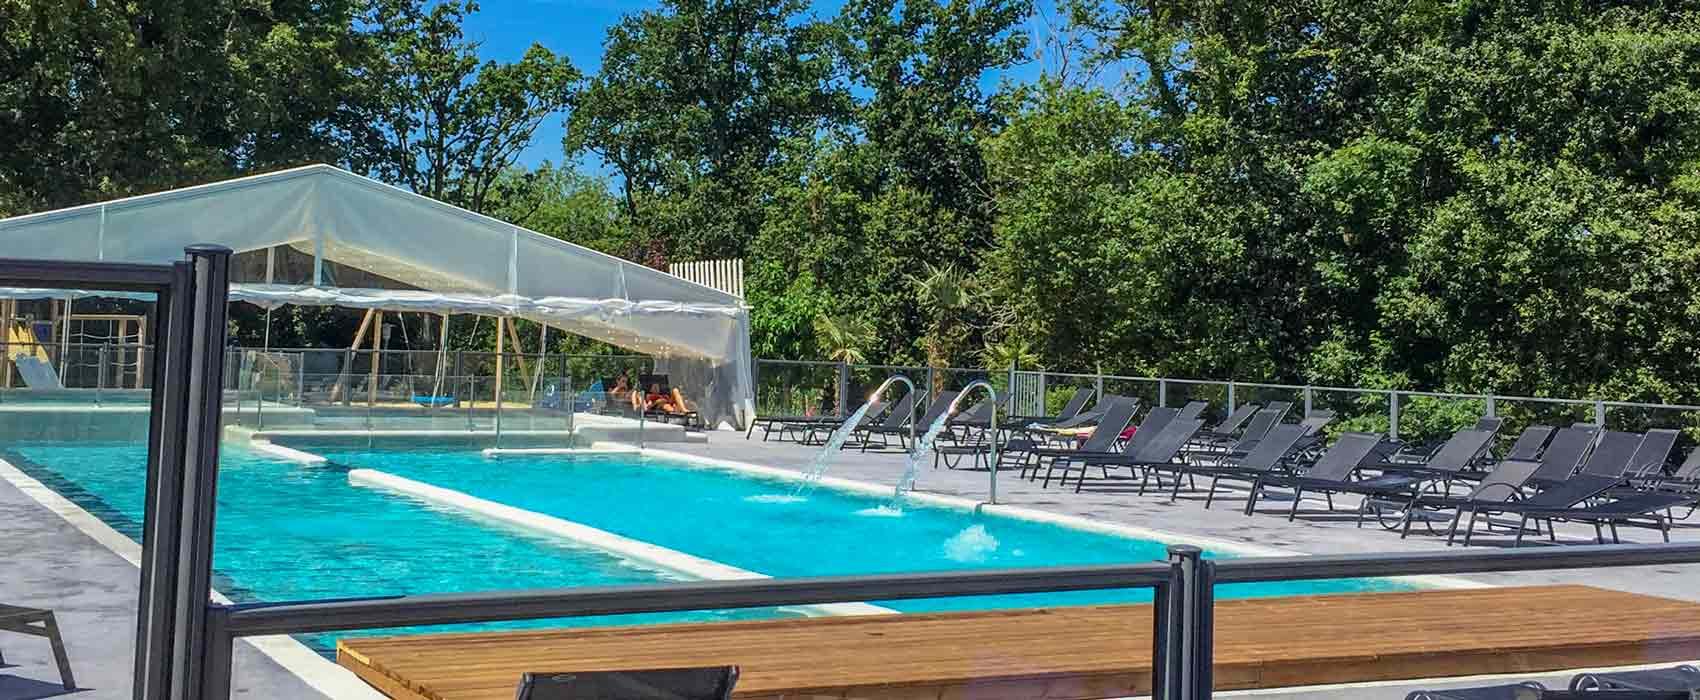 Camping Hendaye | Pays Basque | Camping 4 Étoiles Cote ... pour Camping Mimizan Avec Piscine